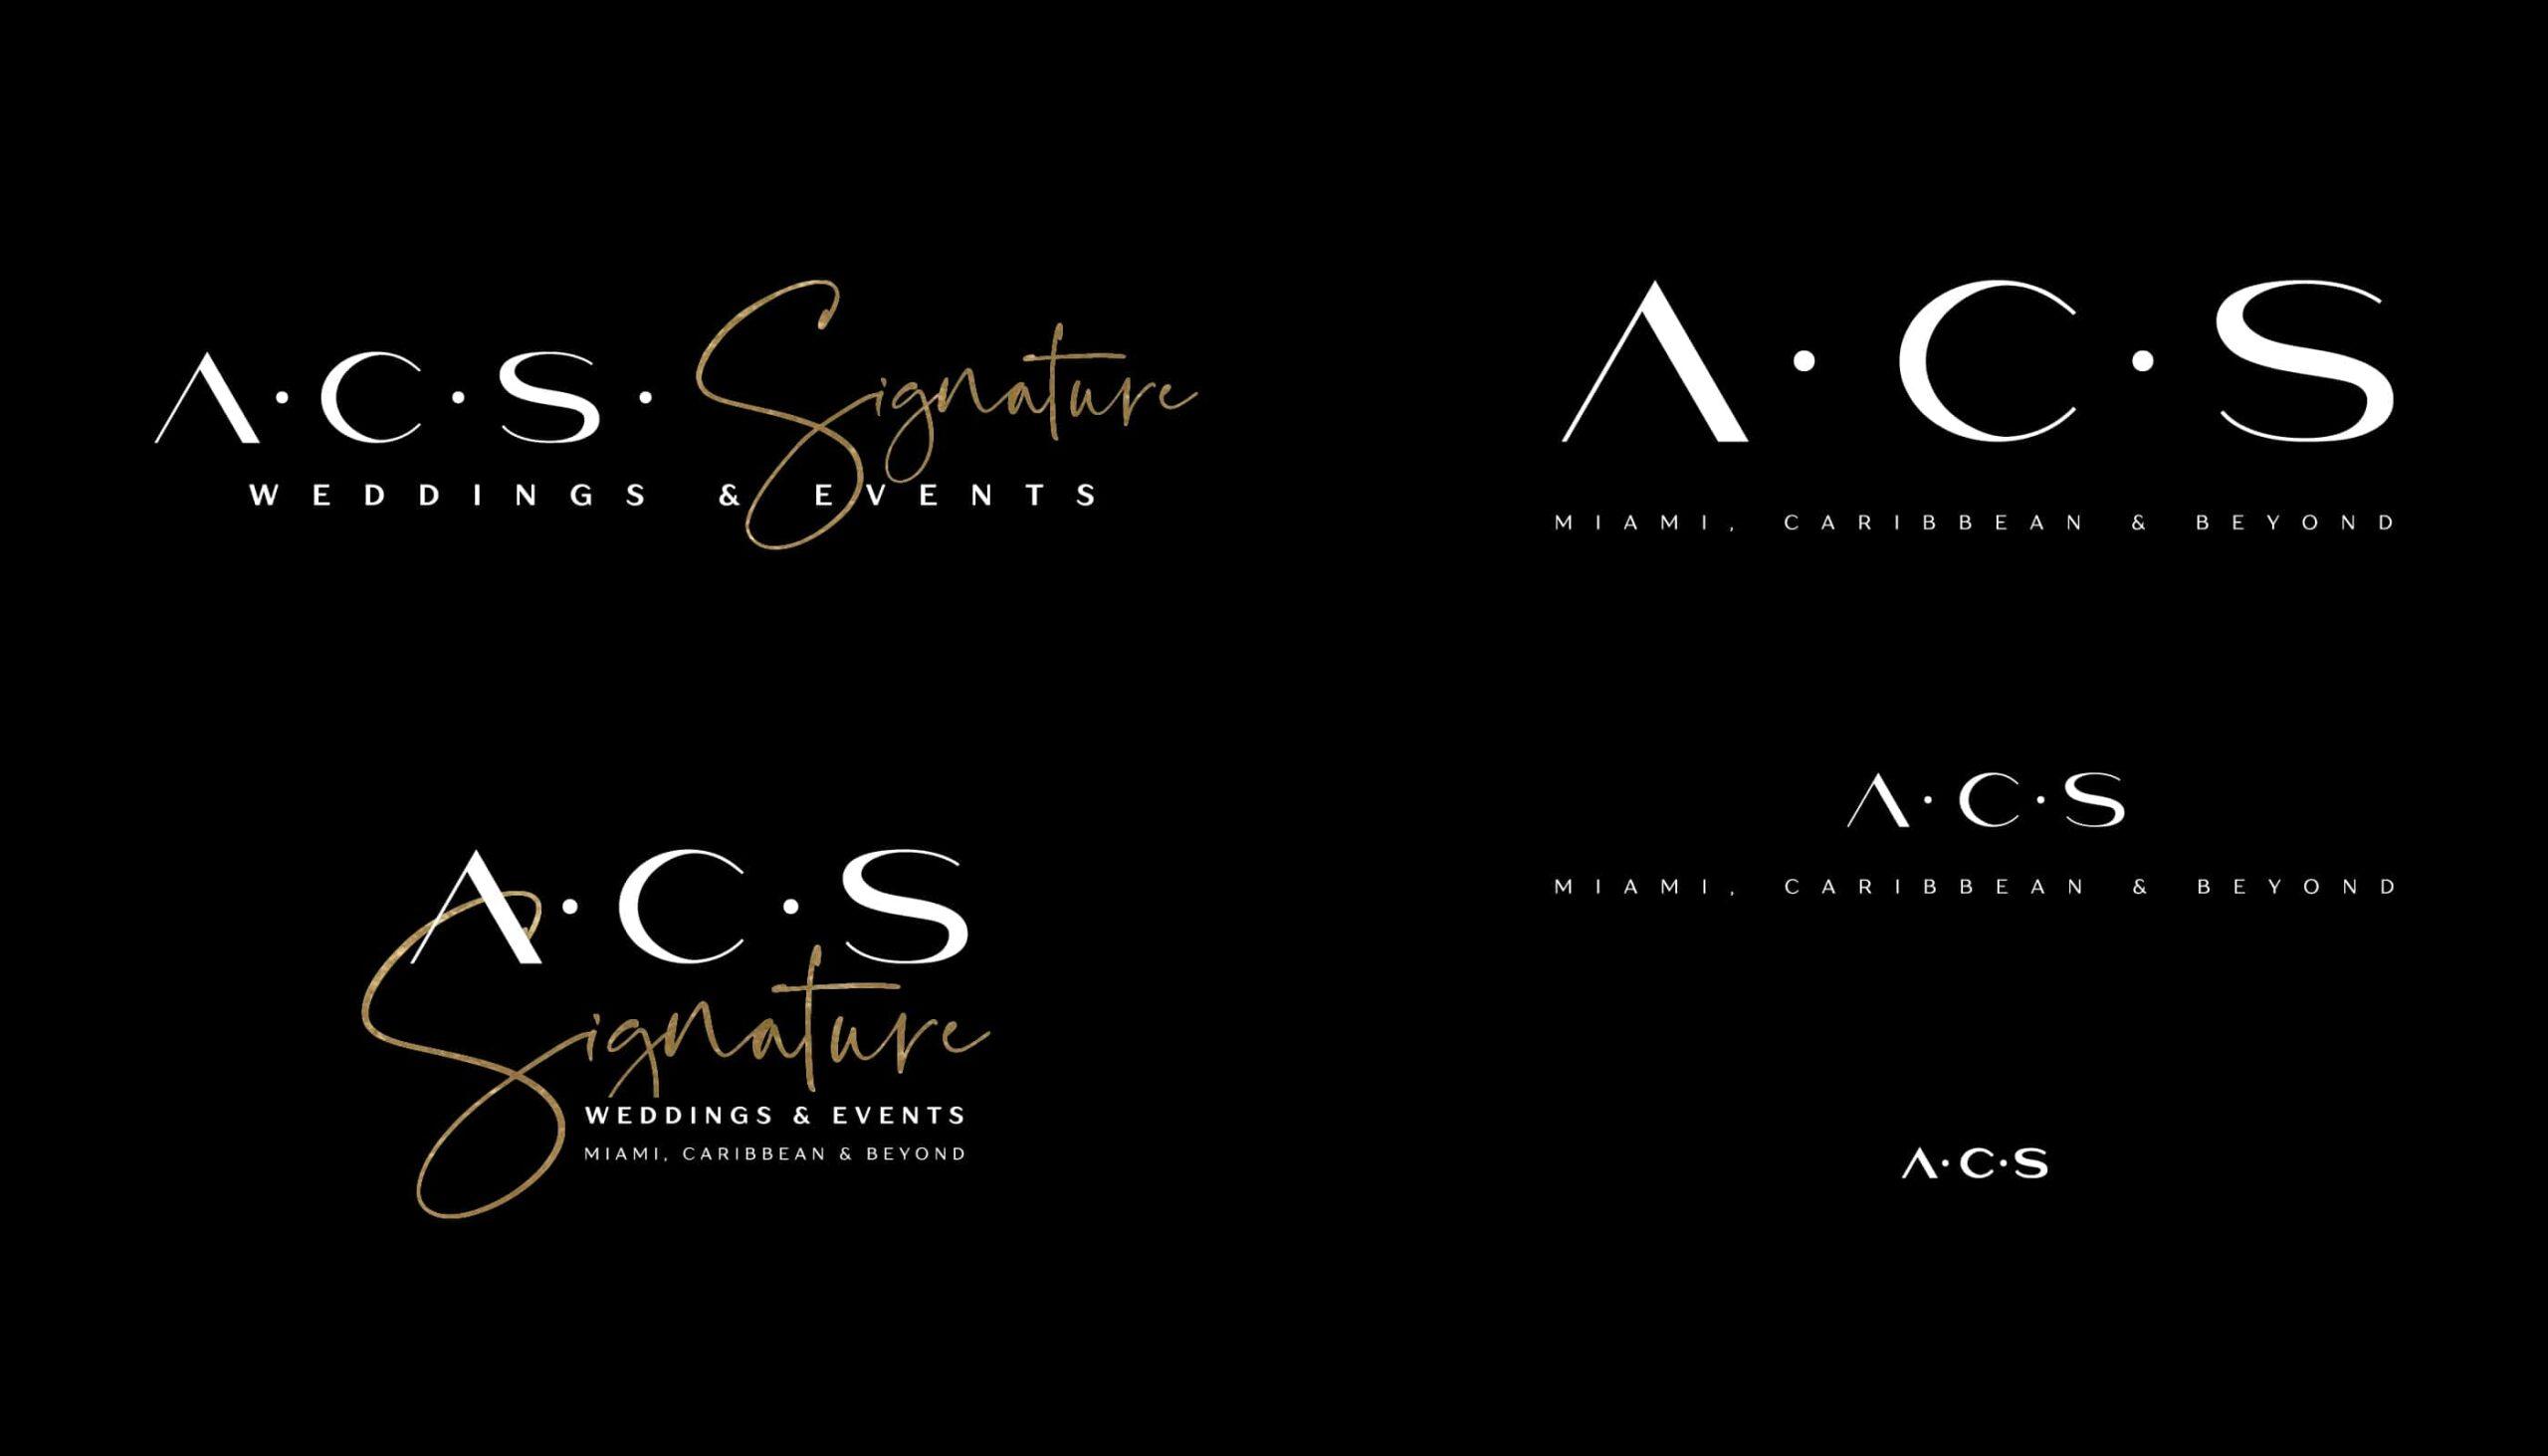 5 ACS Logo Configurations